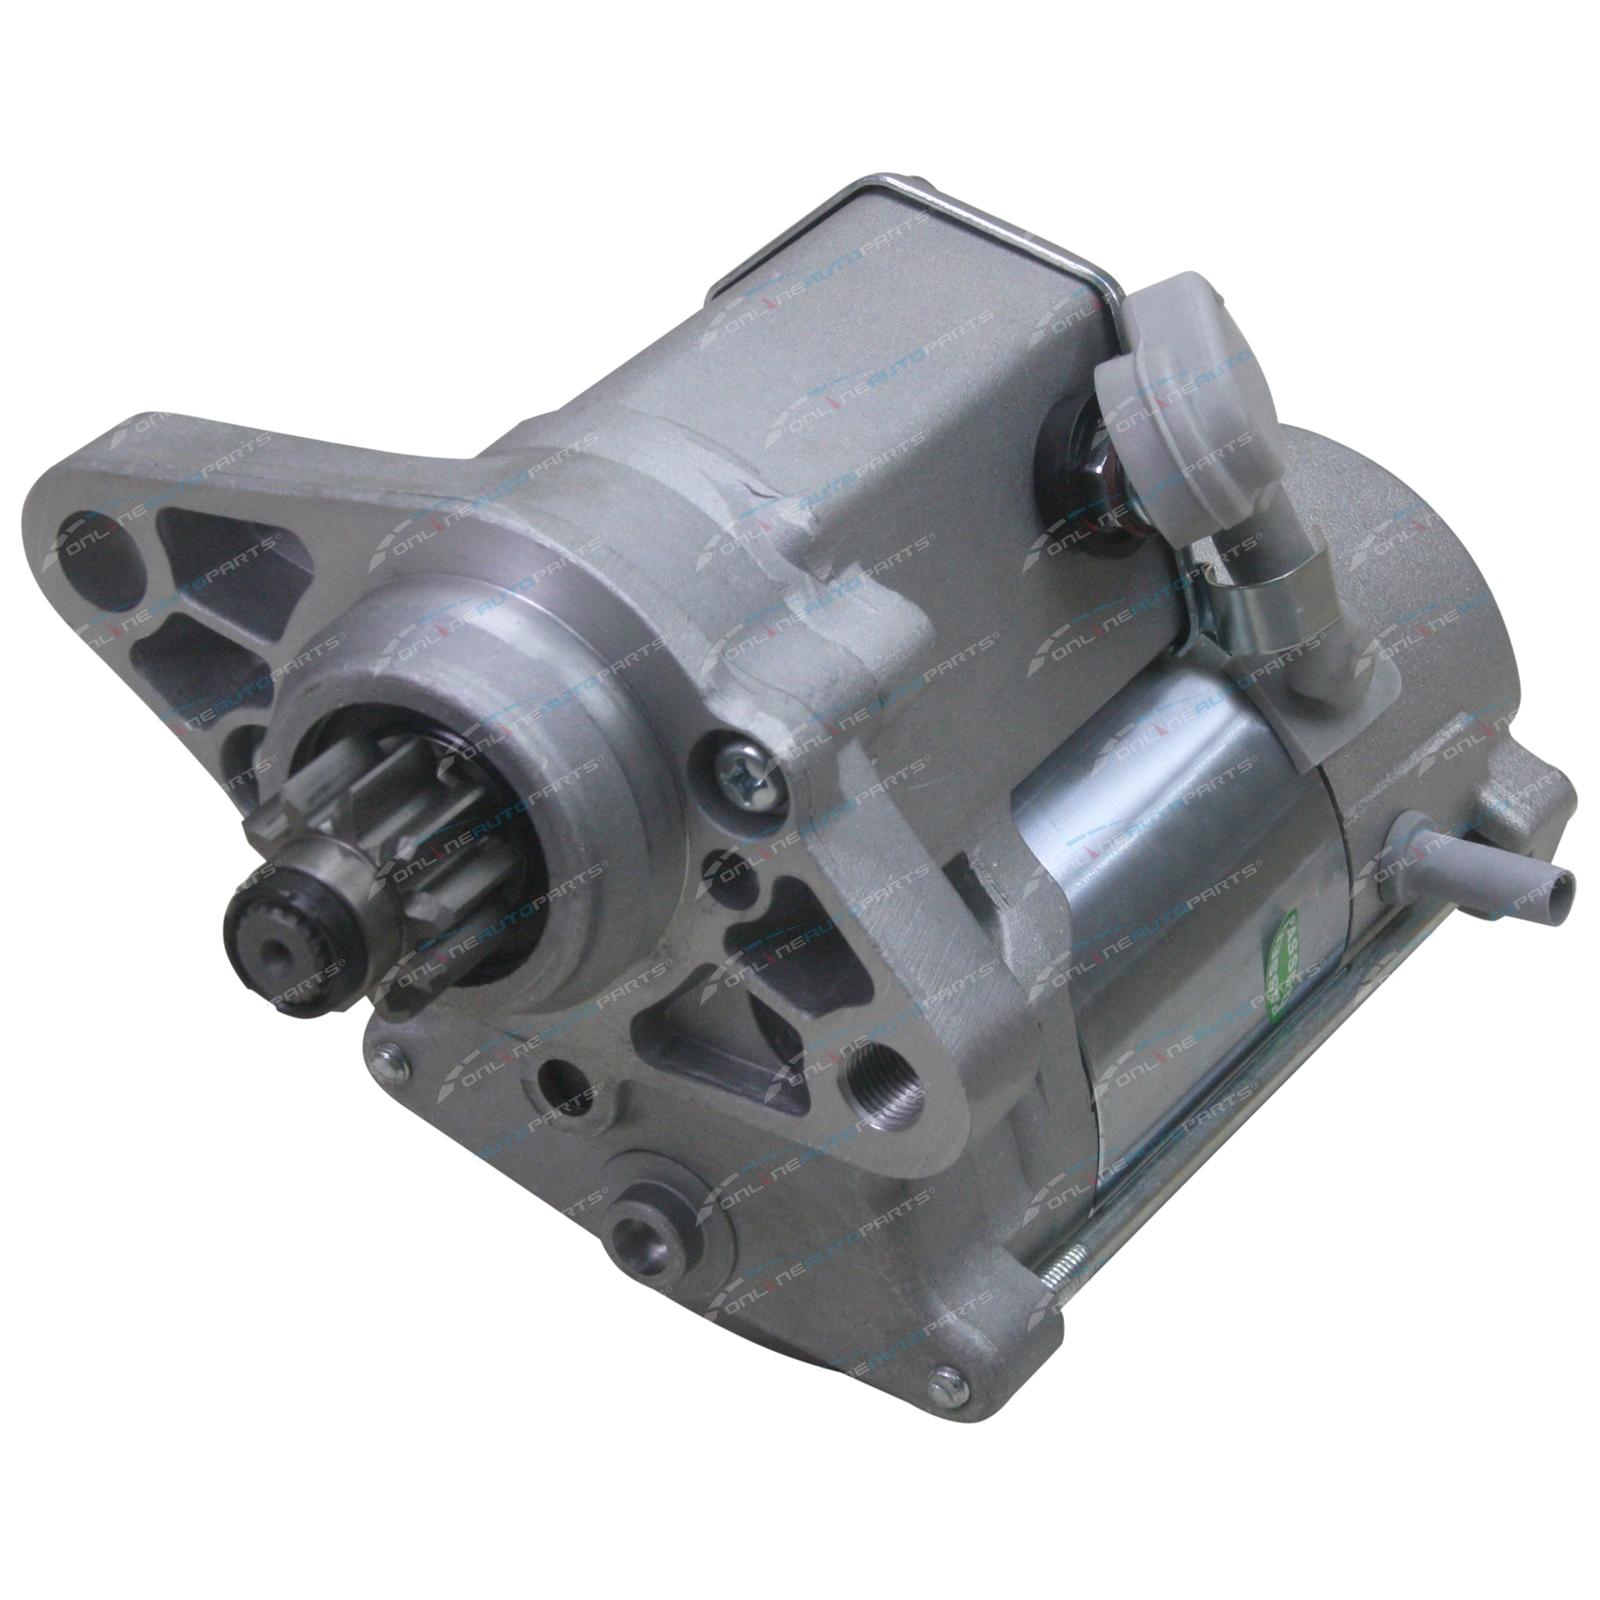 parts engine starter excavator product mitsubishi